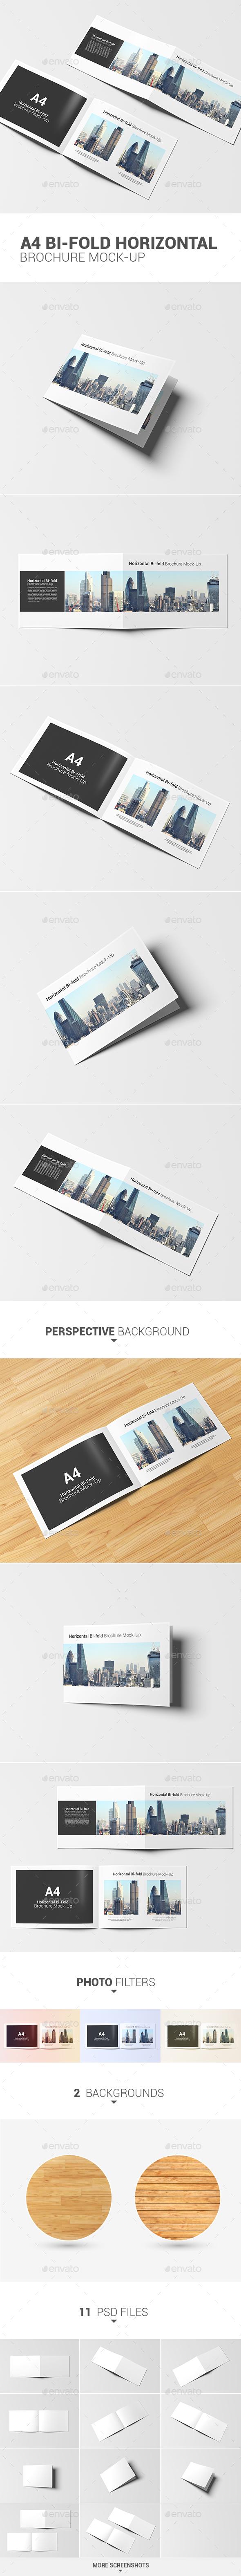 A4 Bi-fold Horizontal Brochure Mock-Up - Product Mock-Ups Graphics